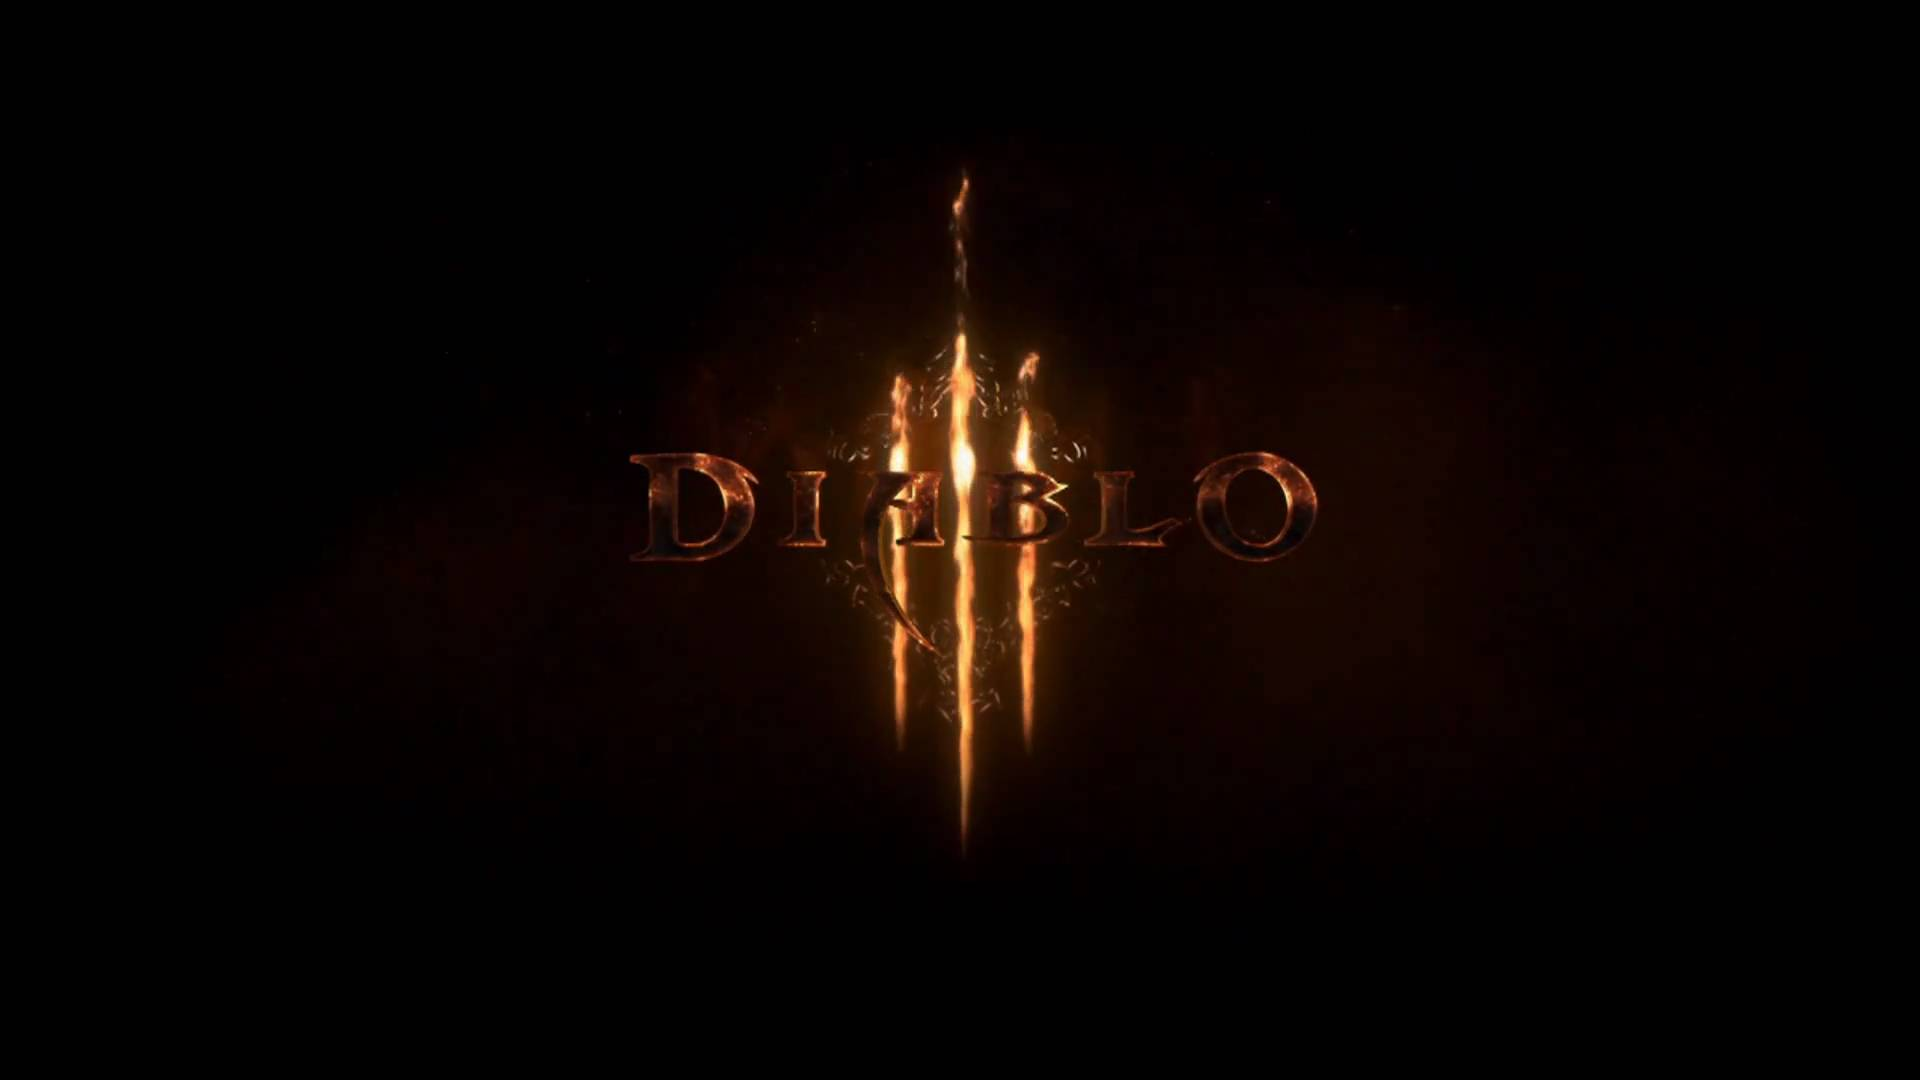 Diablo 3 Wallpapers 1080p Group (71+)